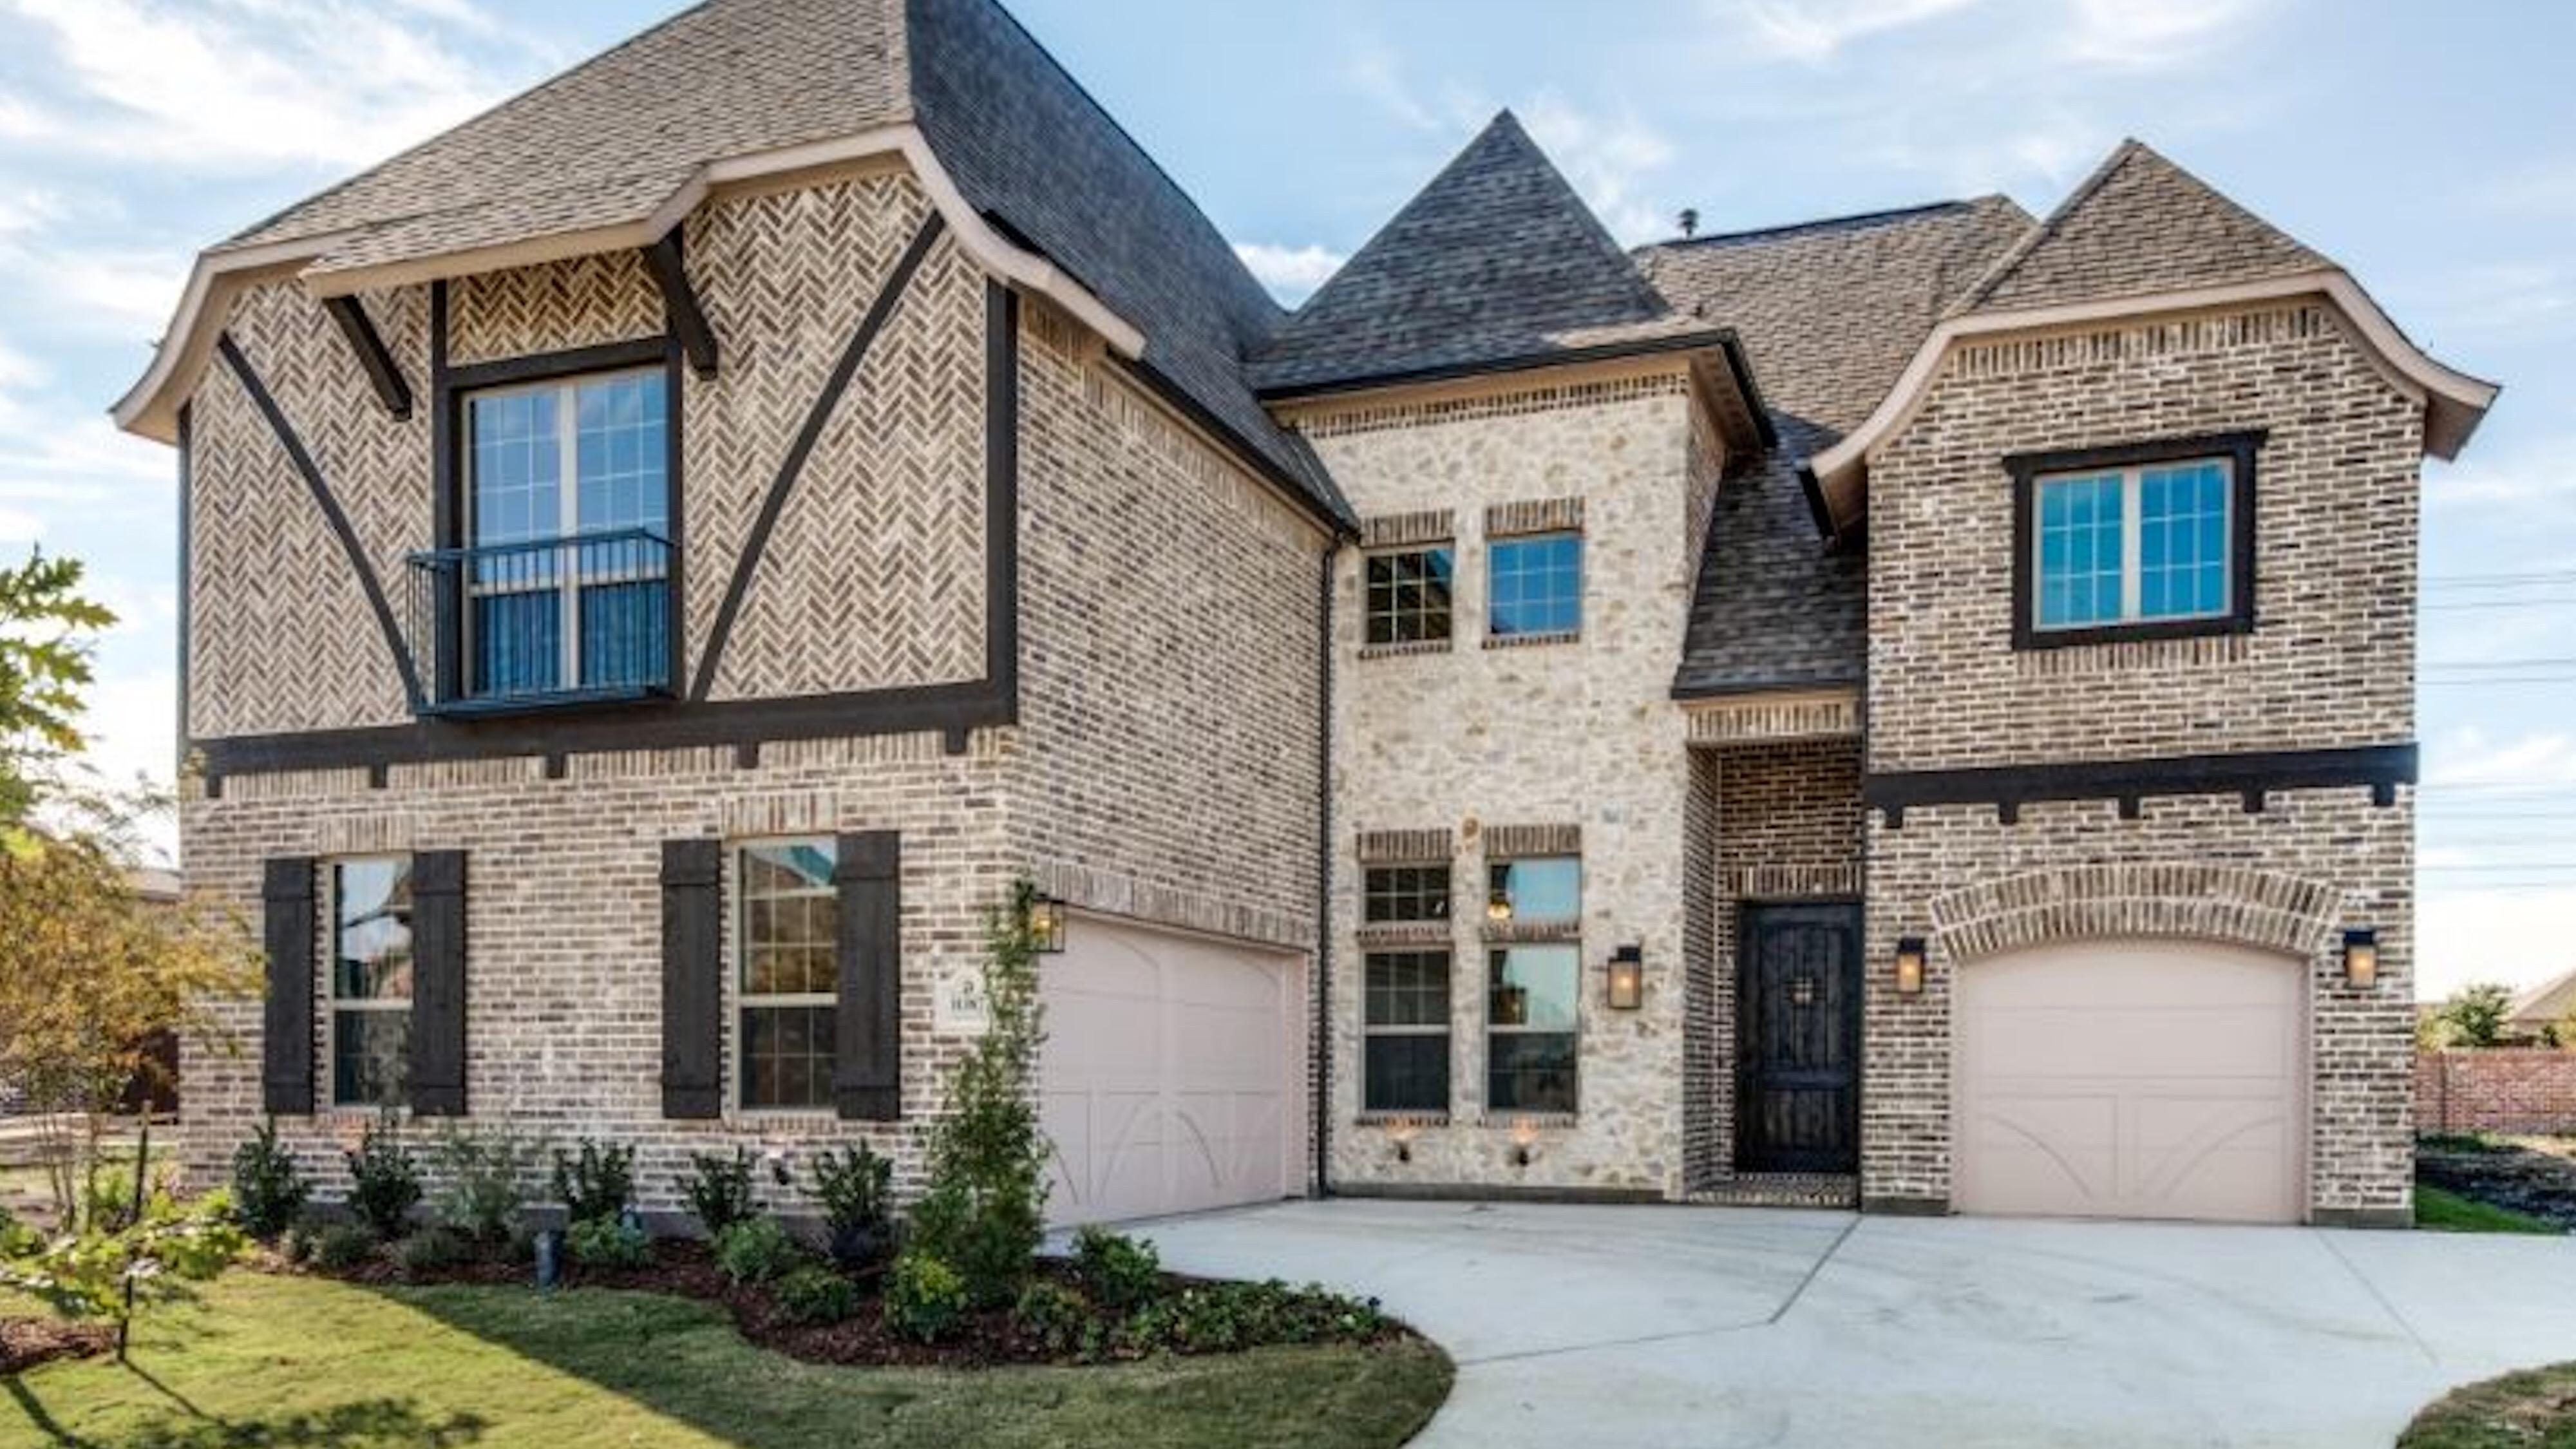 Reduced 50k Expansive Ranch Home With 5 Car Garage: Stonelake Estates